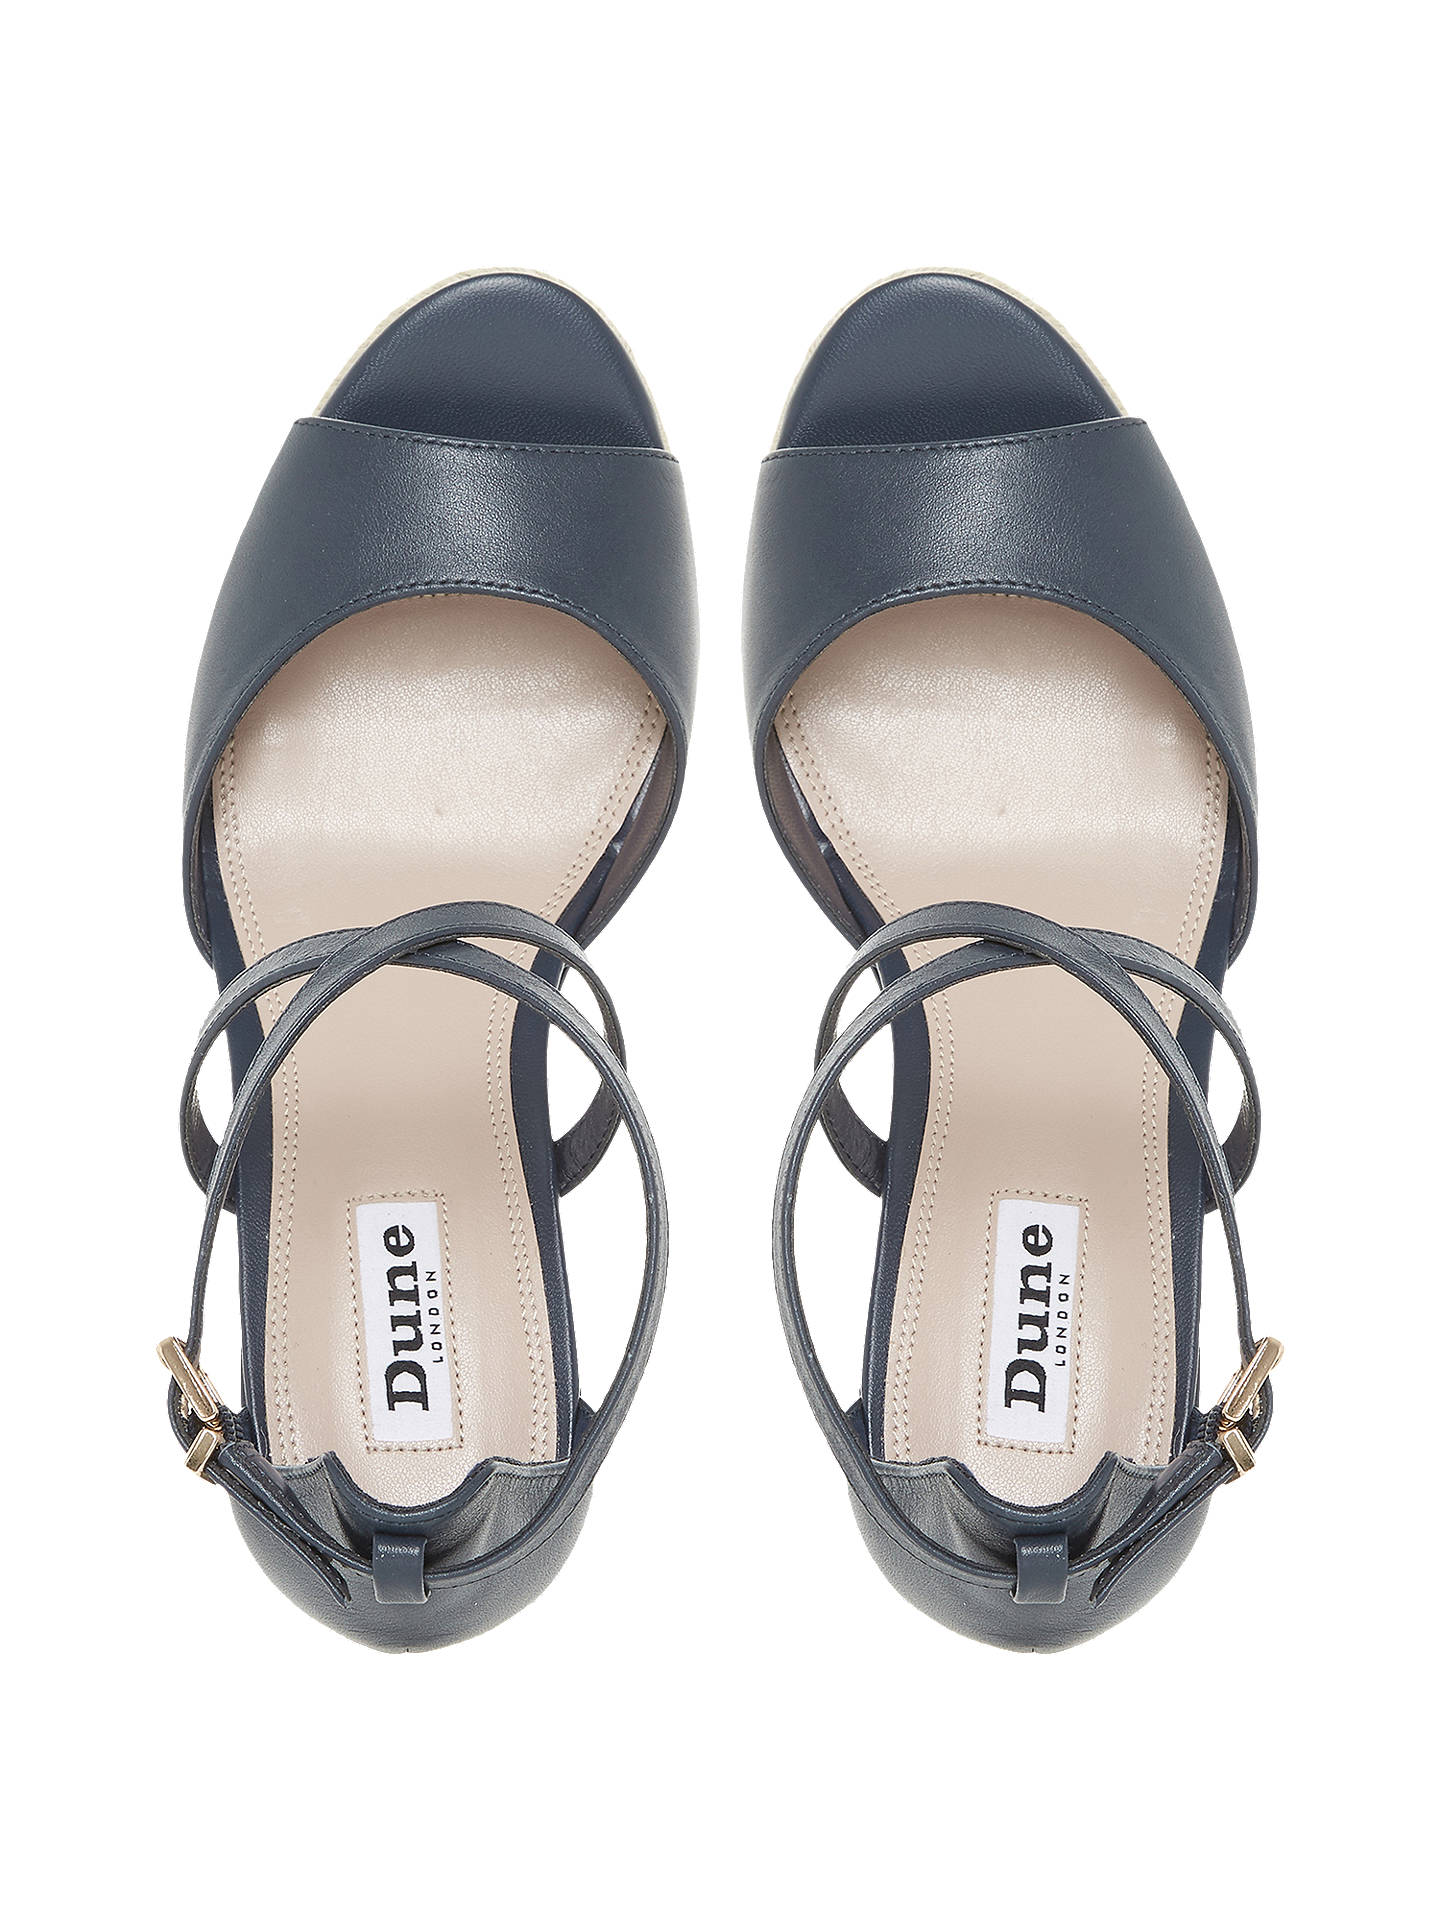 52fcf5d964c63 Buy Dune Kestrel Cross Strap Wedge Sandals, Navy Leather, 3 Online at  johnlewis.